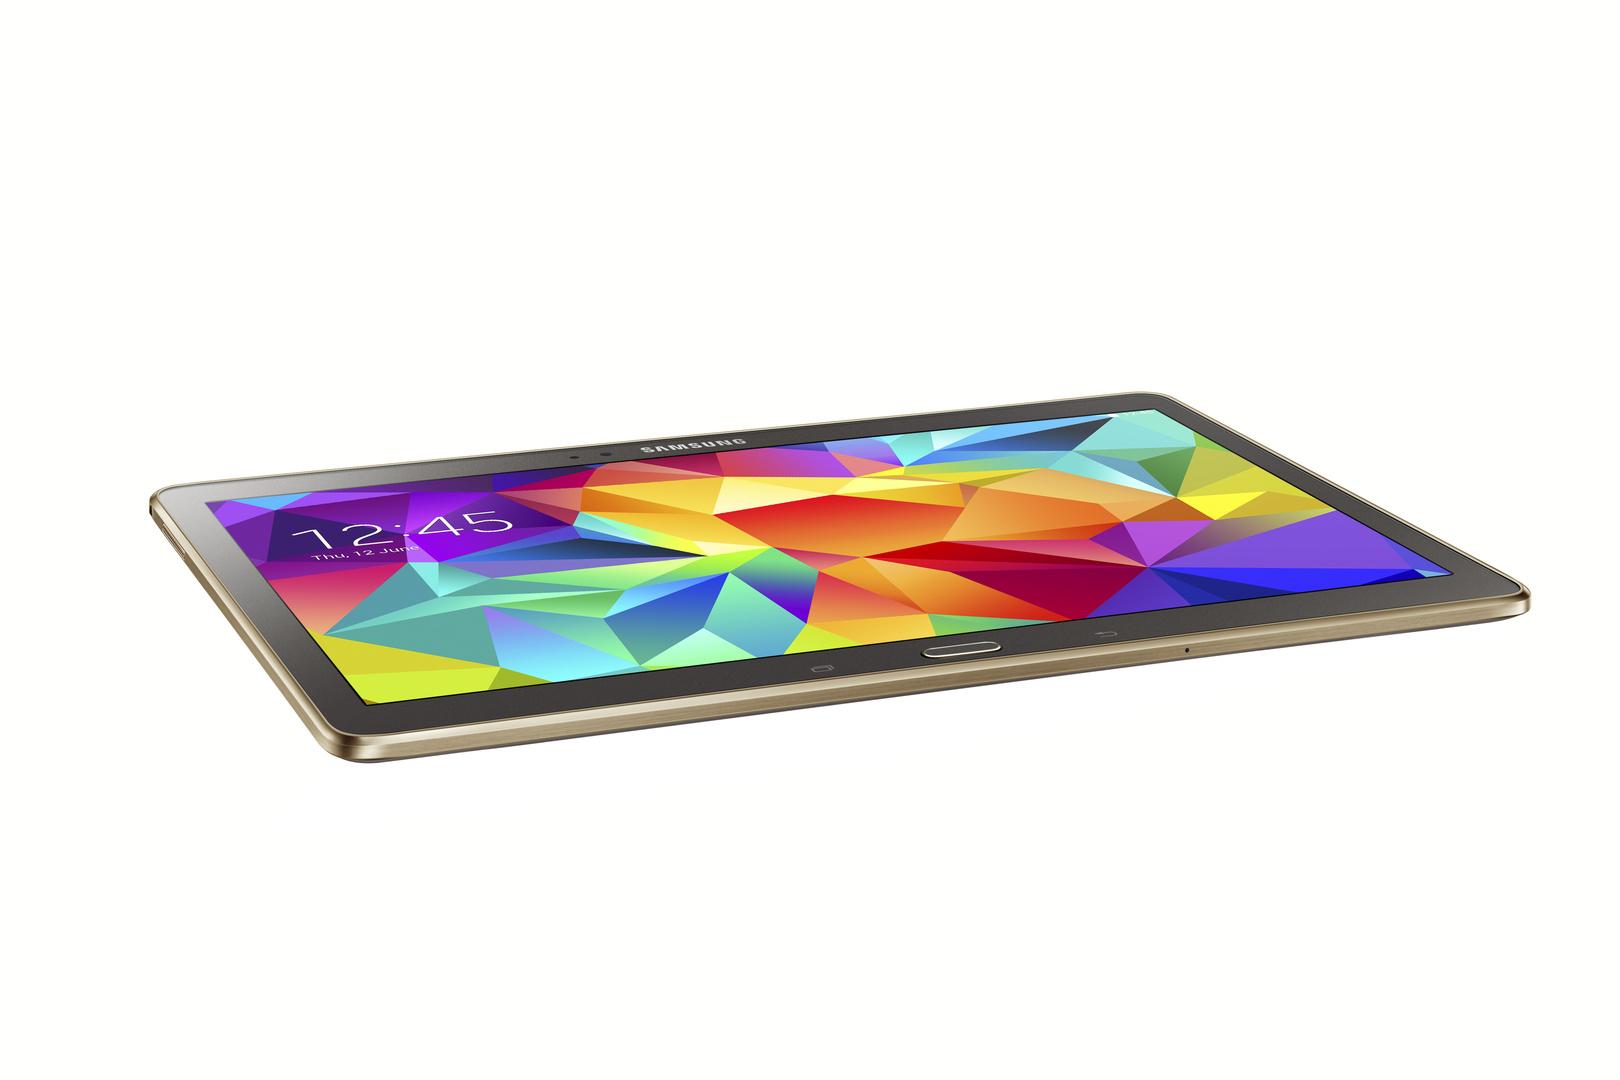 Samsung Galaxy Tab S 8.4 und 10.5